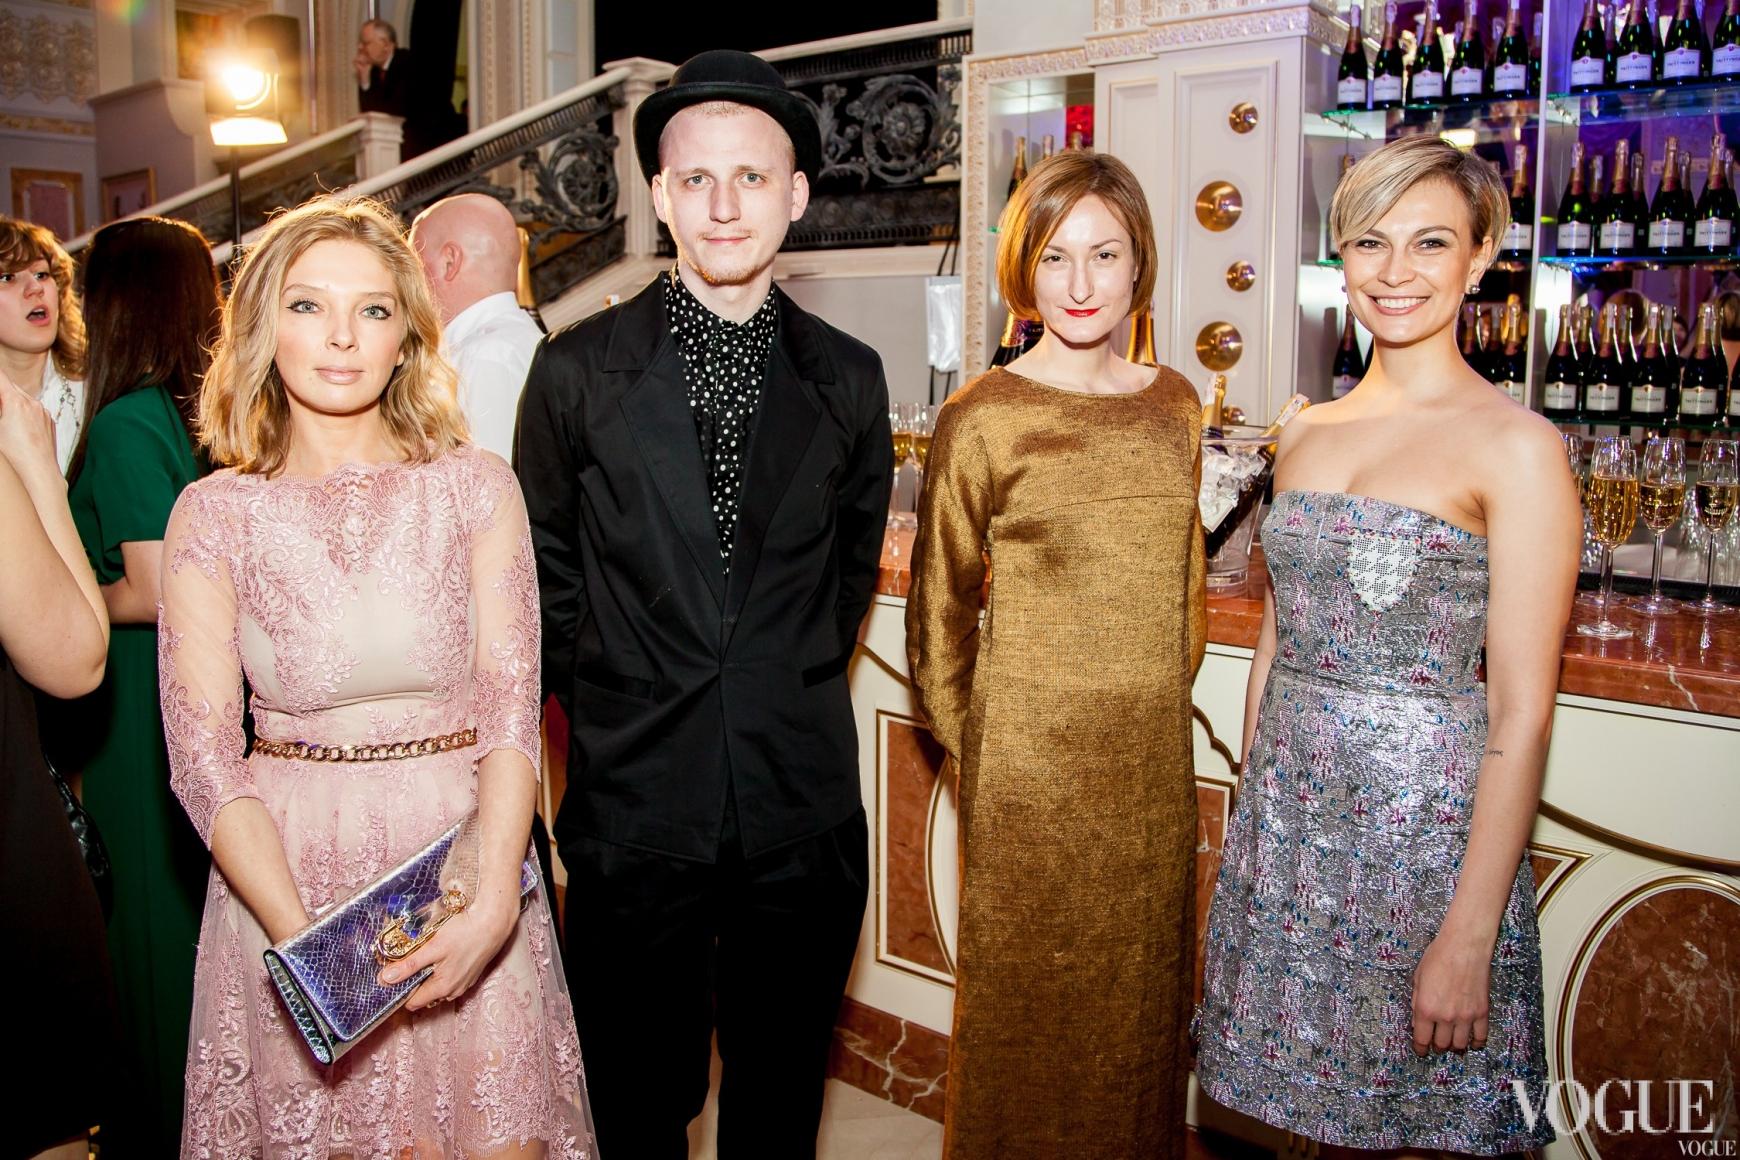 Ольга Навроцкая, Артем Климчук, Татьяна Соловей, Маша Цуканова